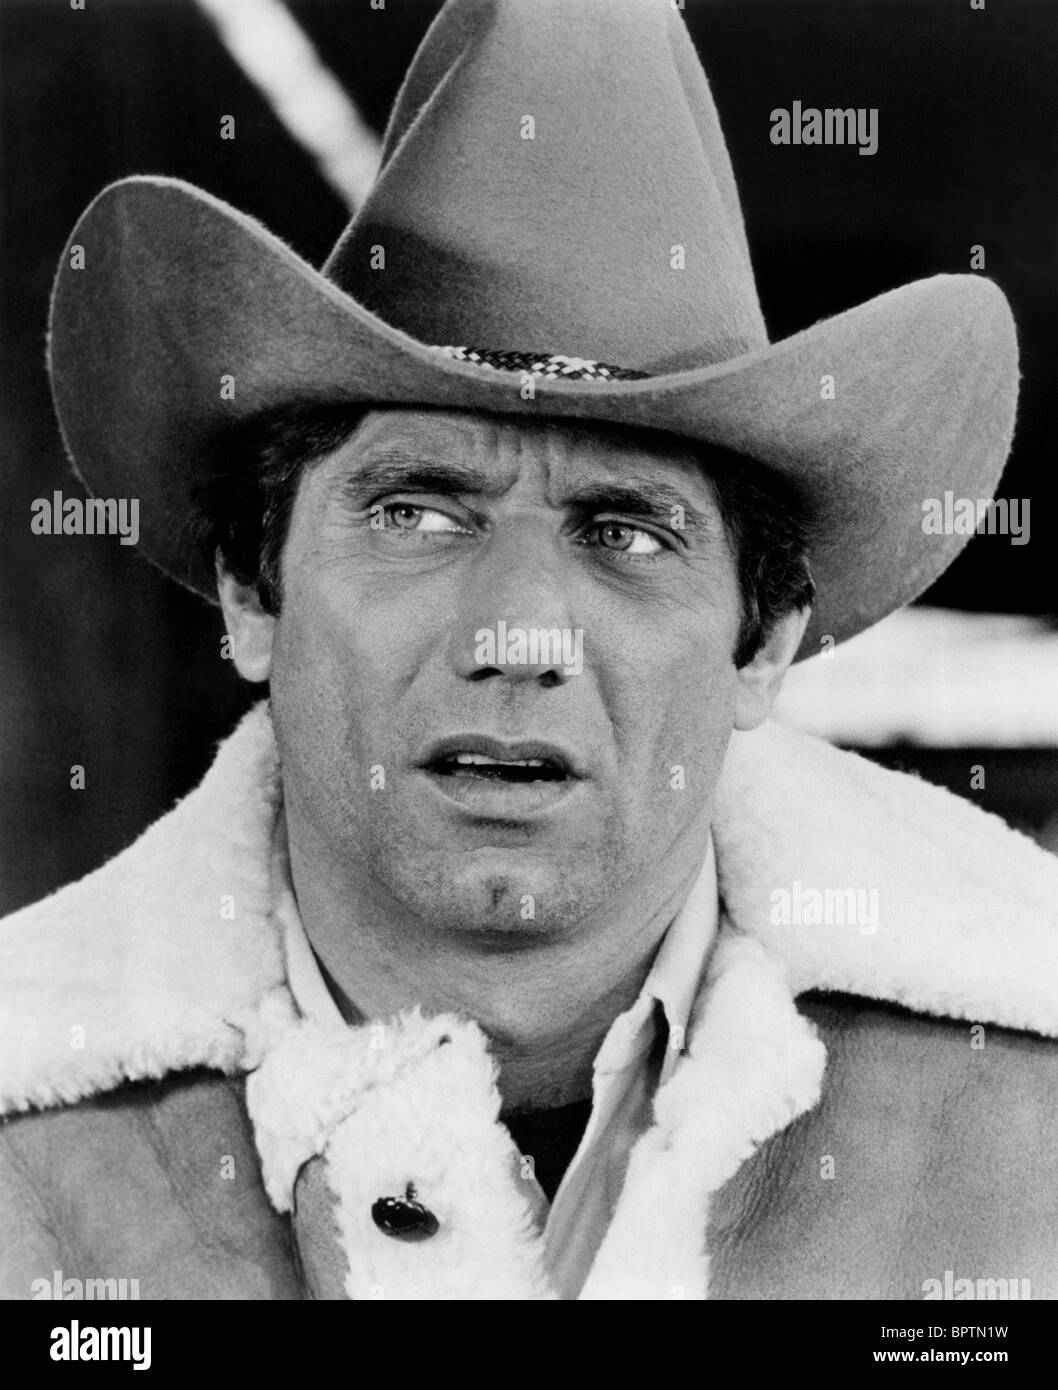 JOE NAMATH ACTOR (1972) - Stock Image